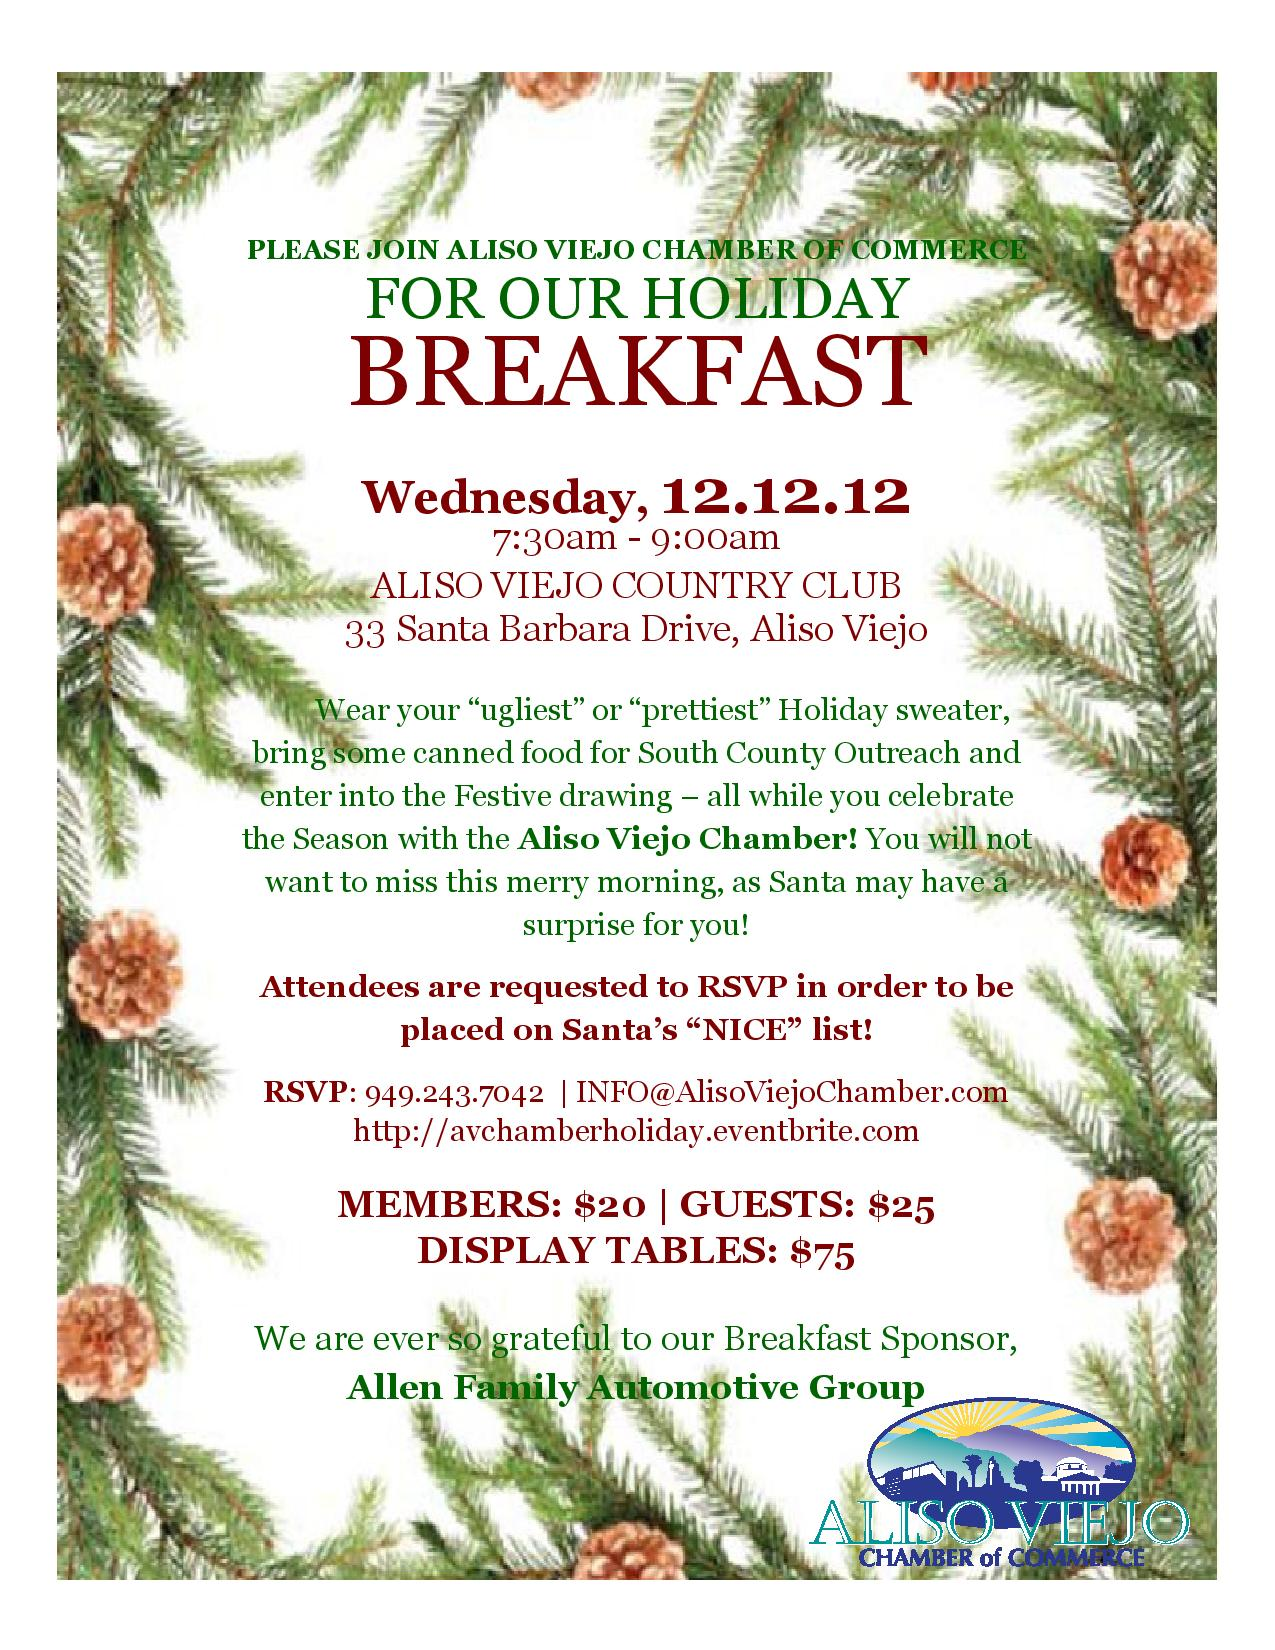 Aliso Viejo Chamber Holiday Breakfast — OC Lifestyle